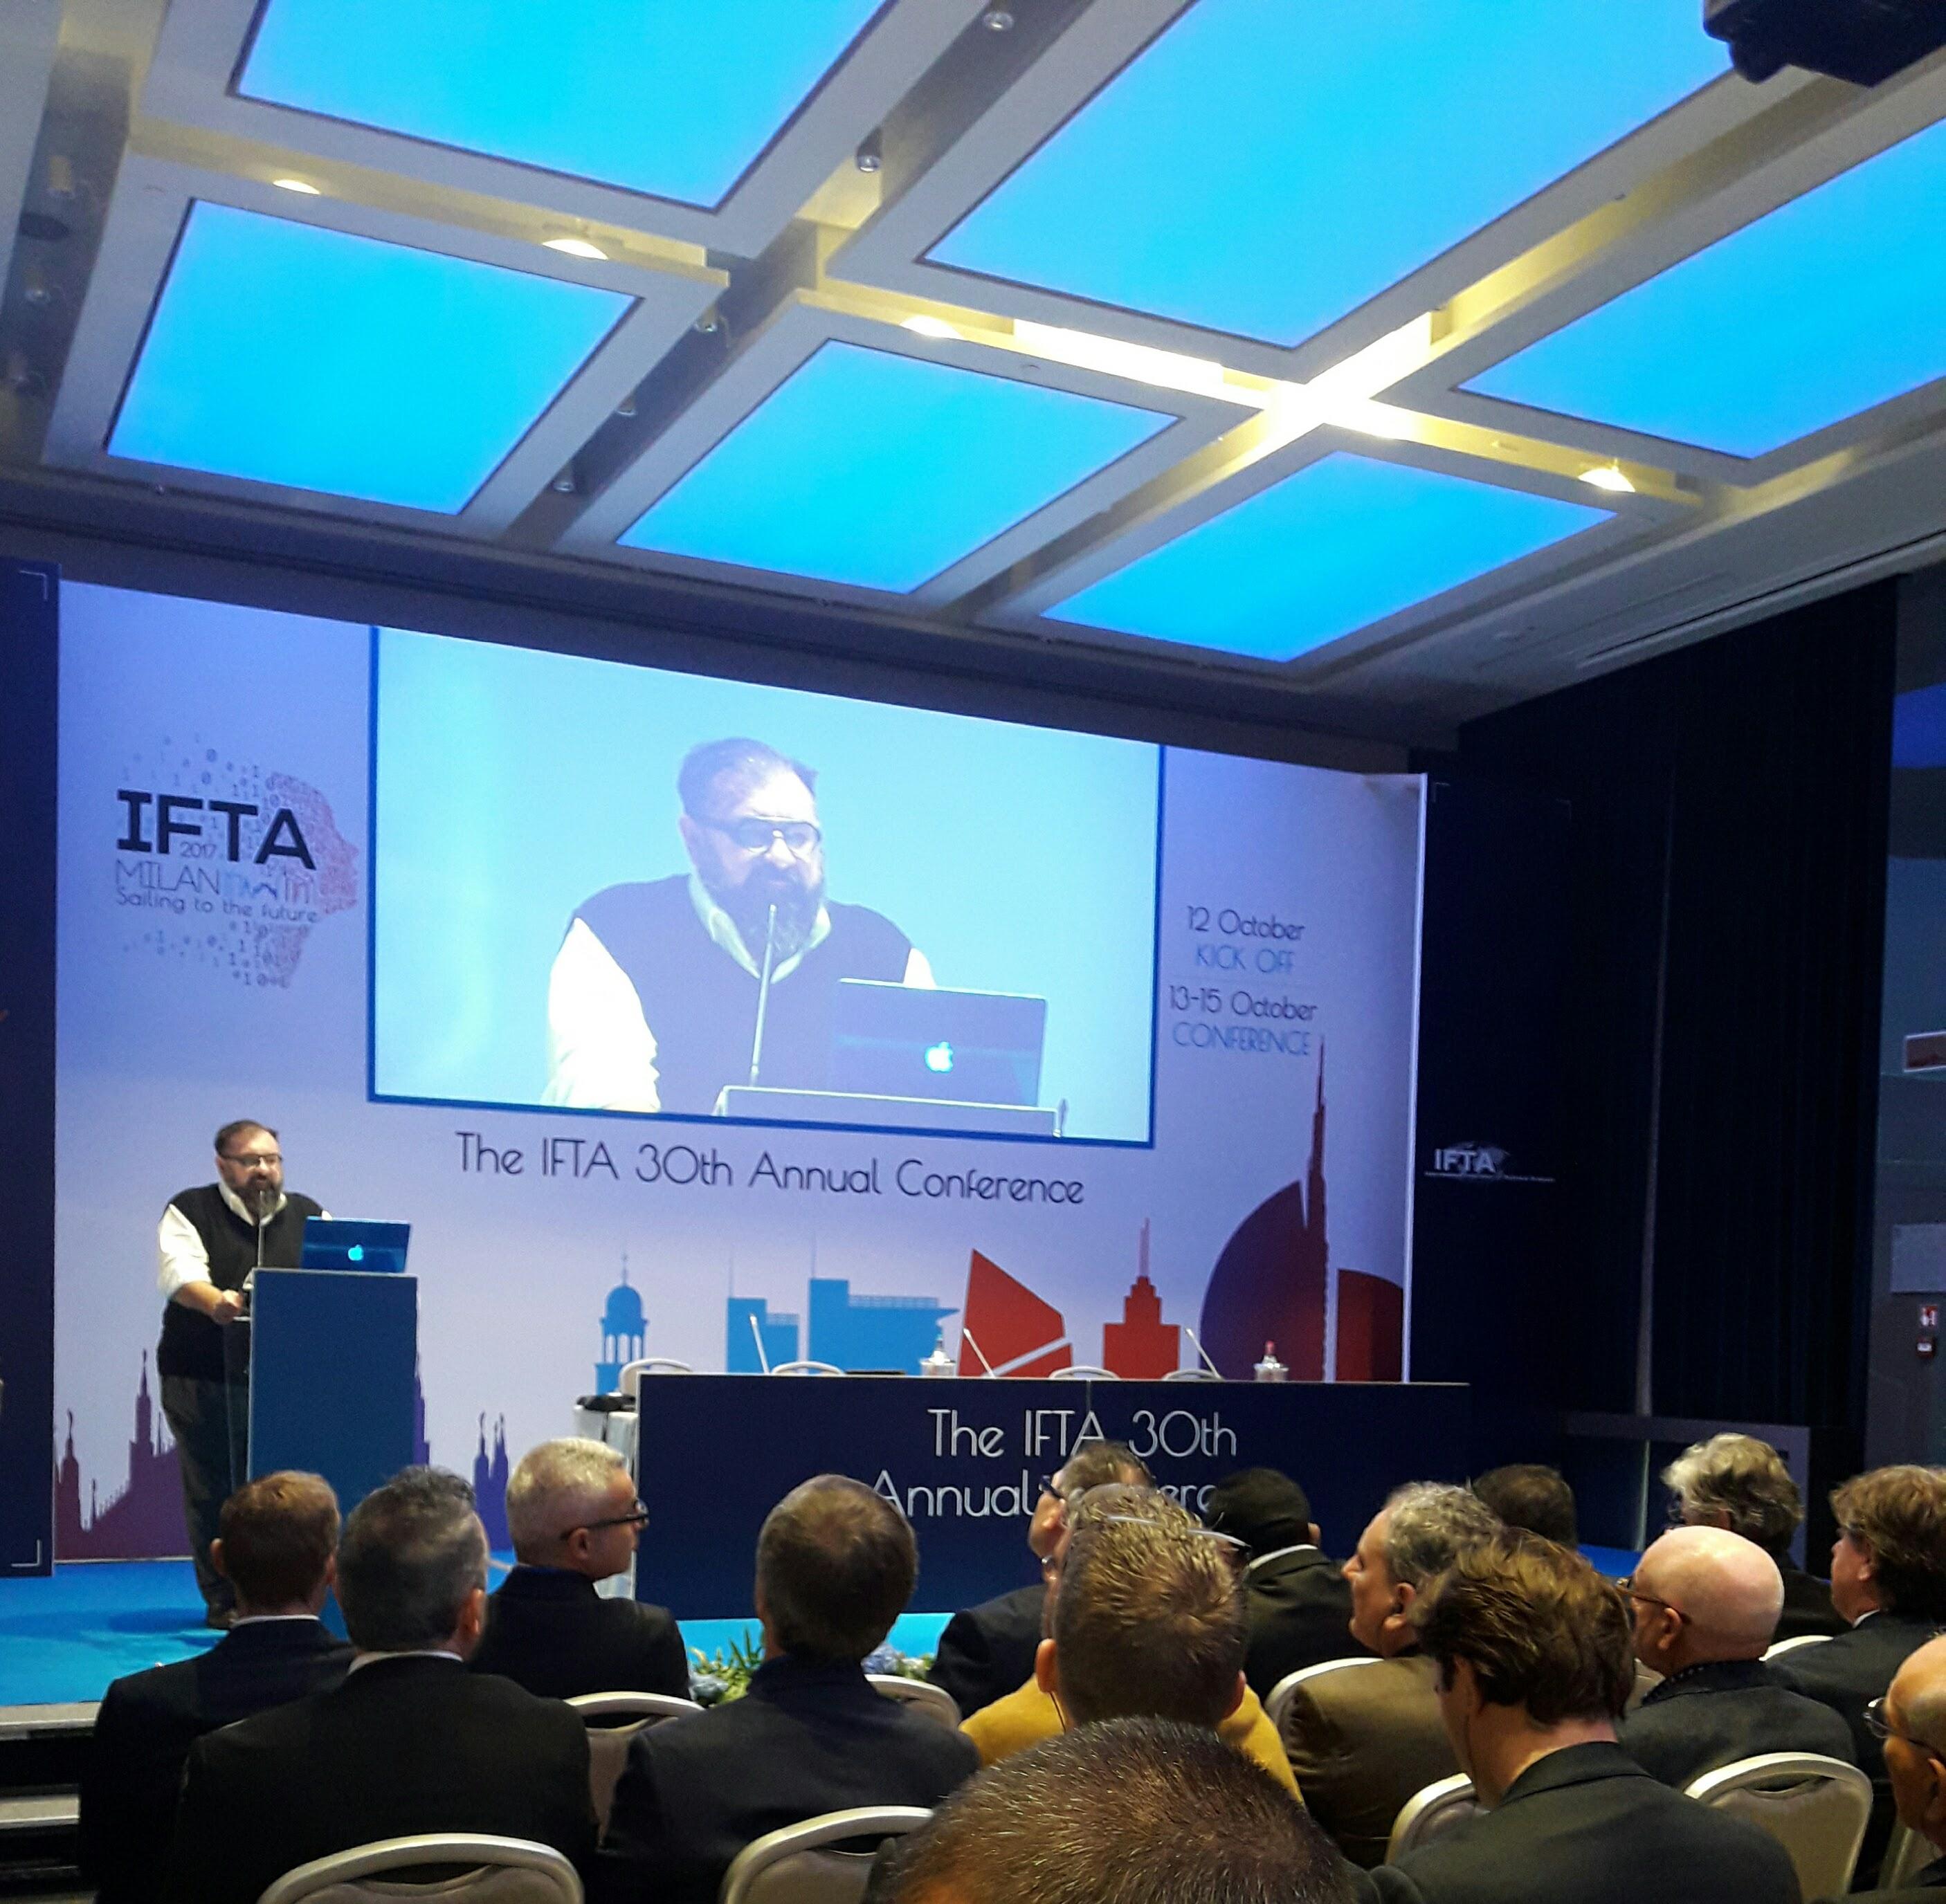 IFTA2017: a bis success!